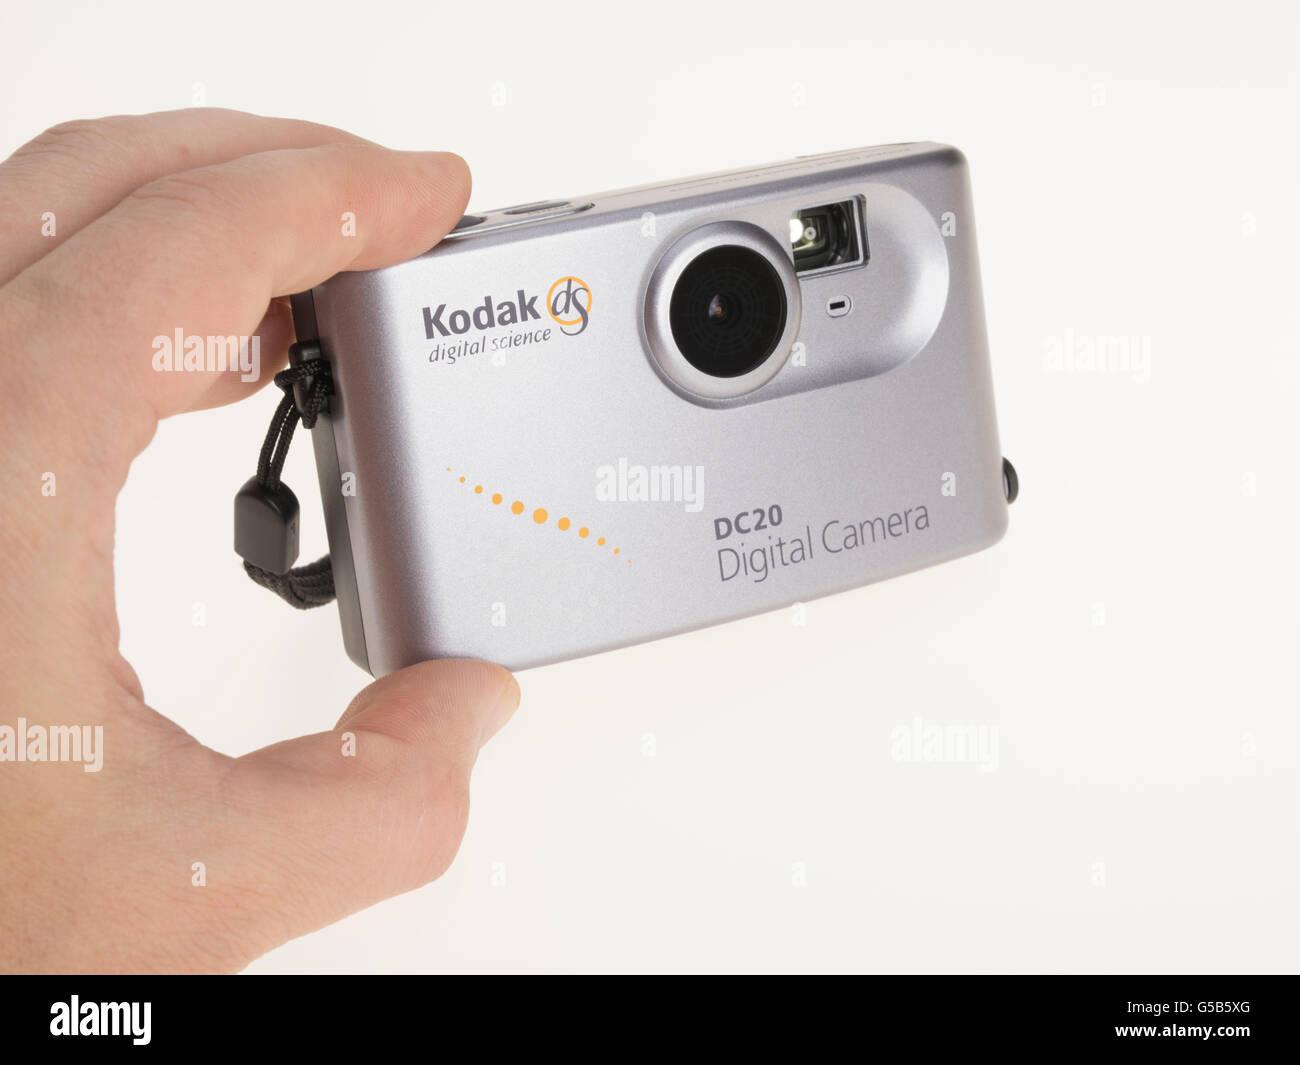 Kodak dS digital science DC20 digital camera released by Kodak in 1996 - Stock Image